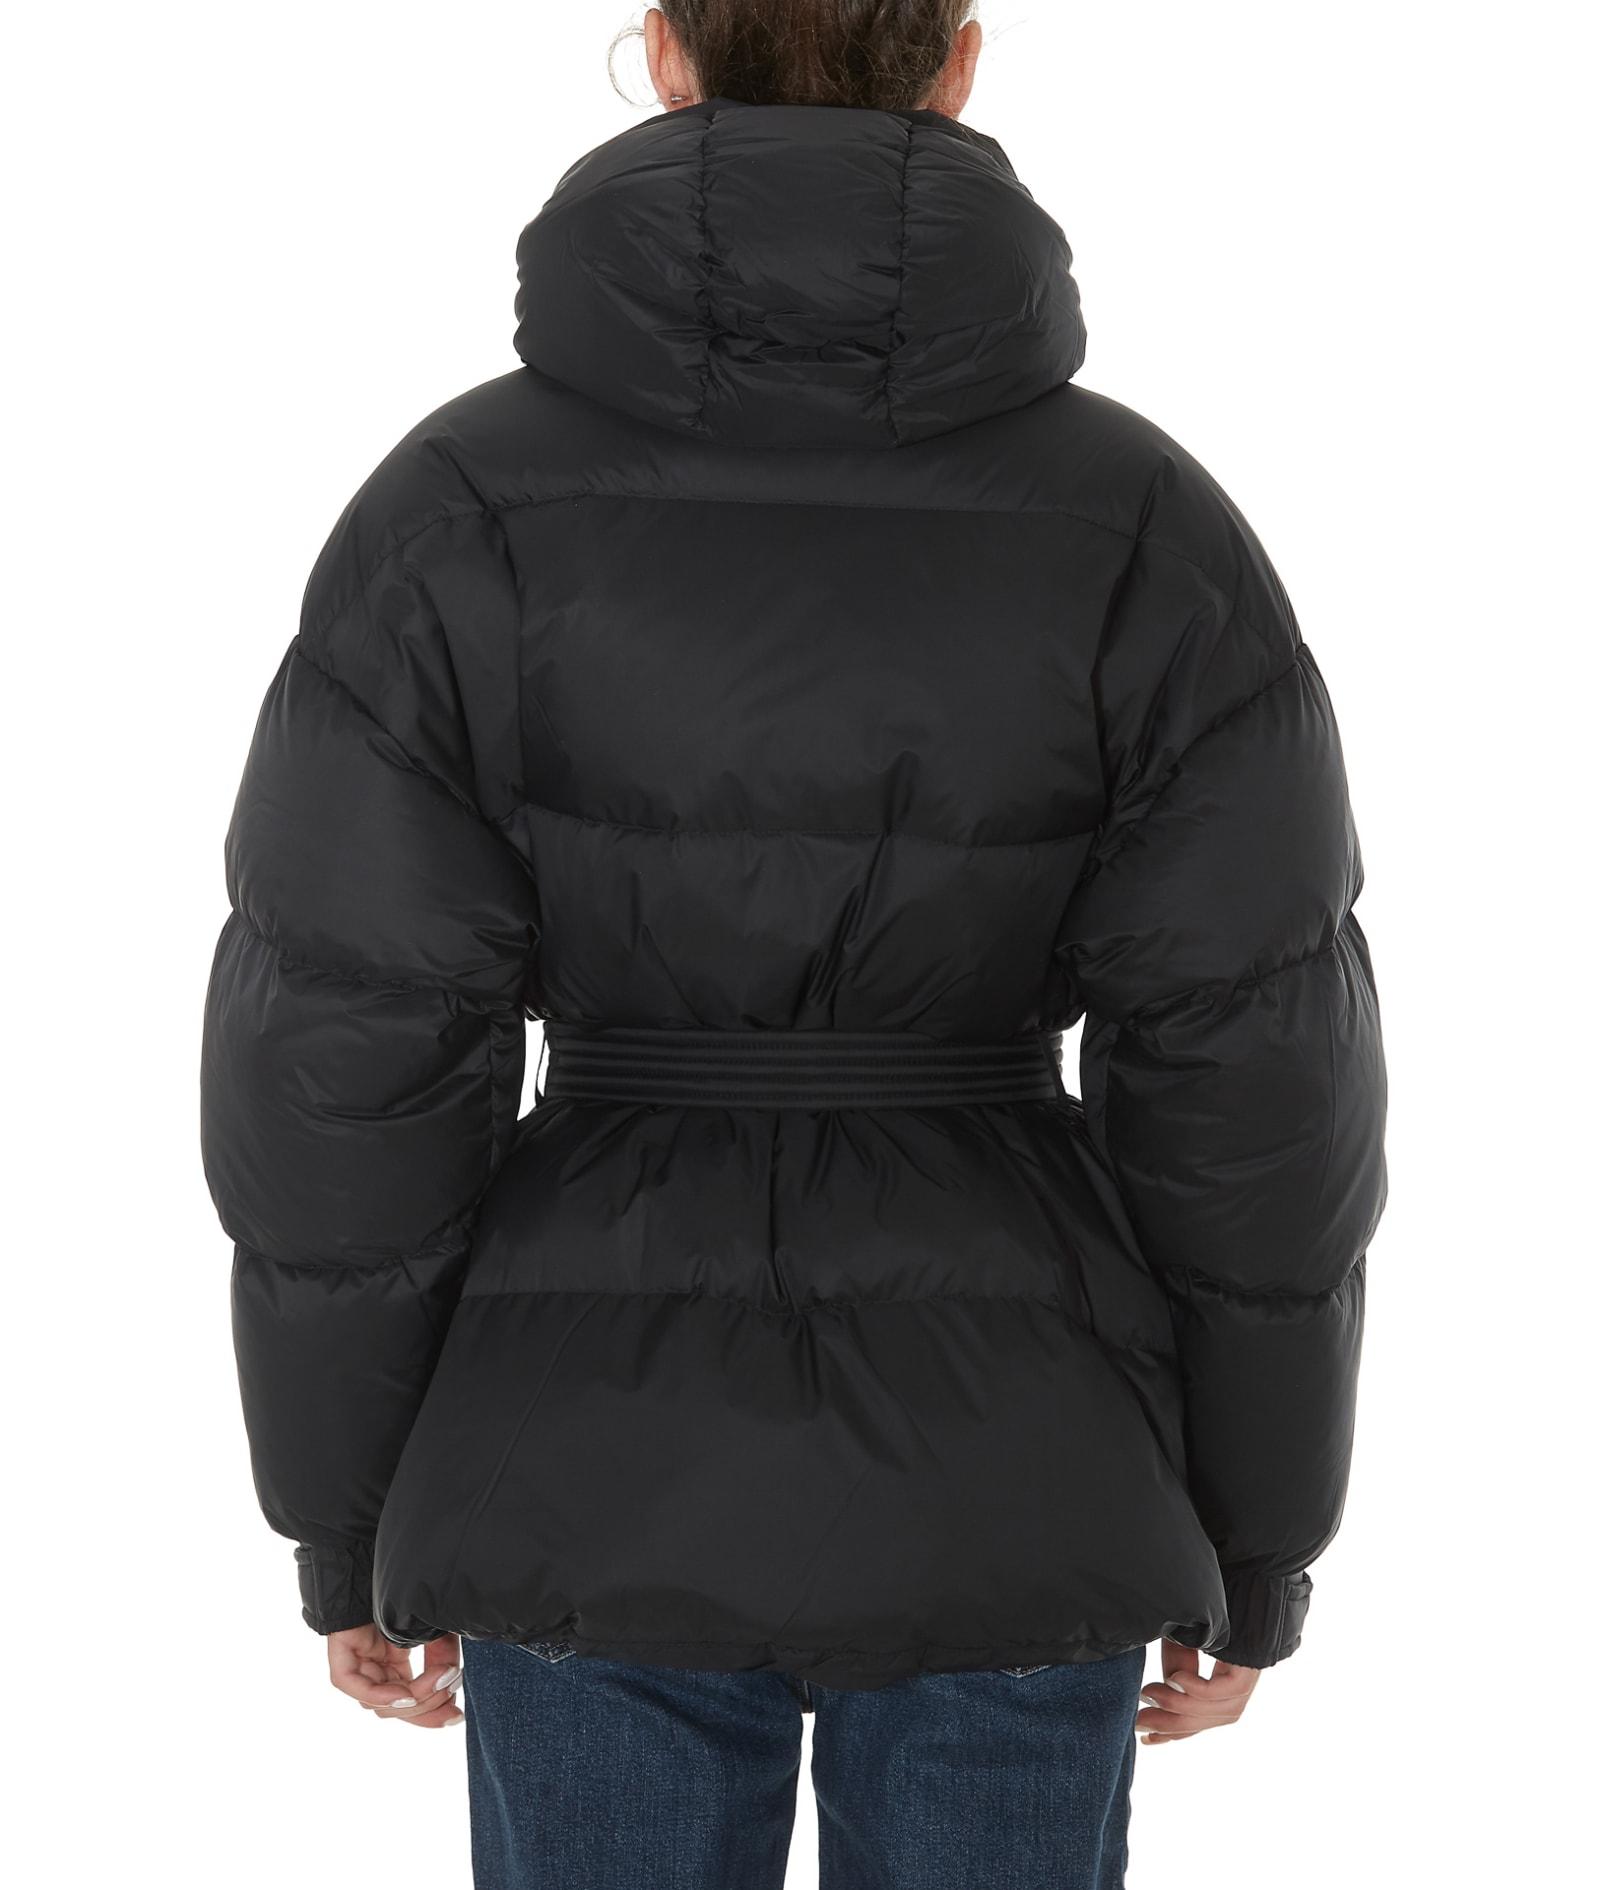 Ienki Ienki Michlin Down Jacket